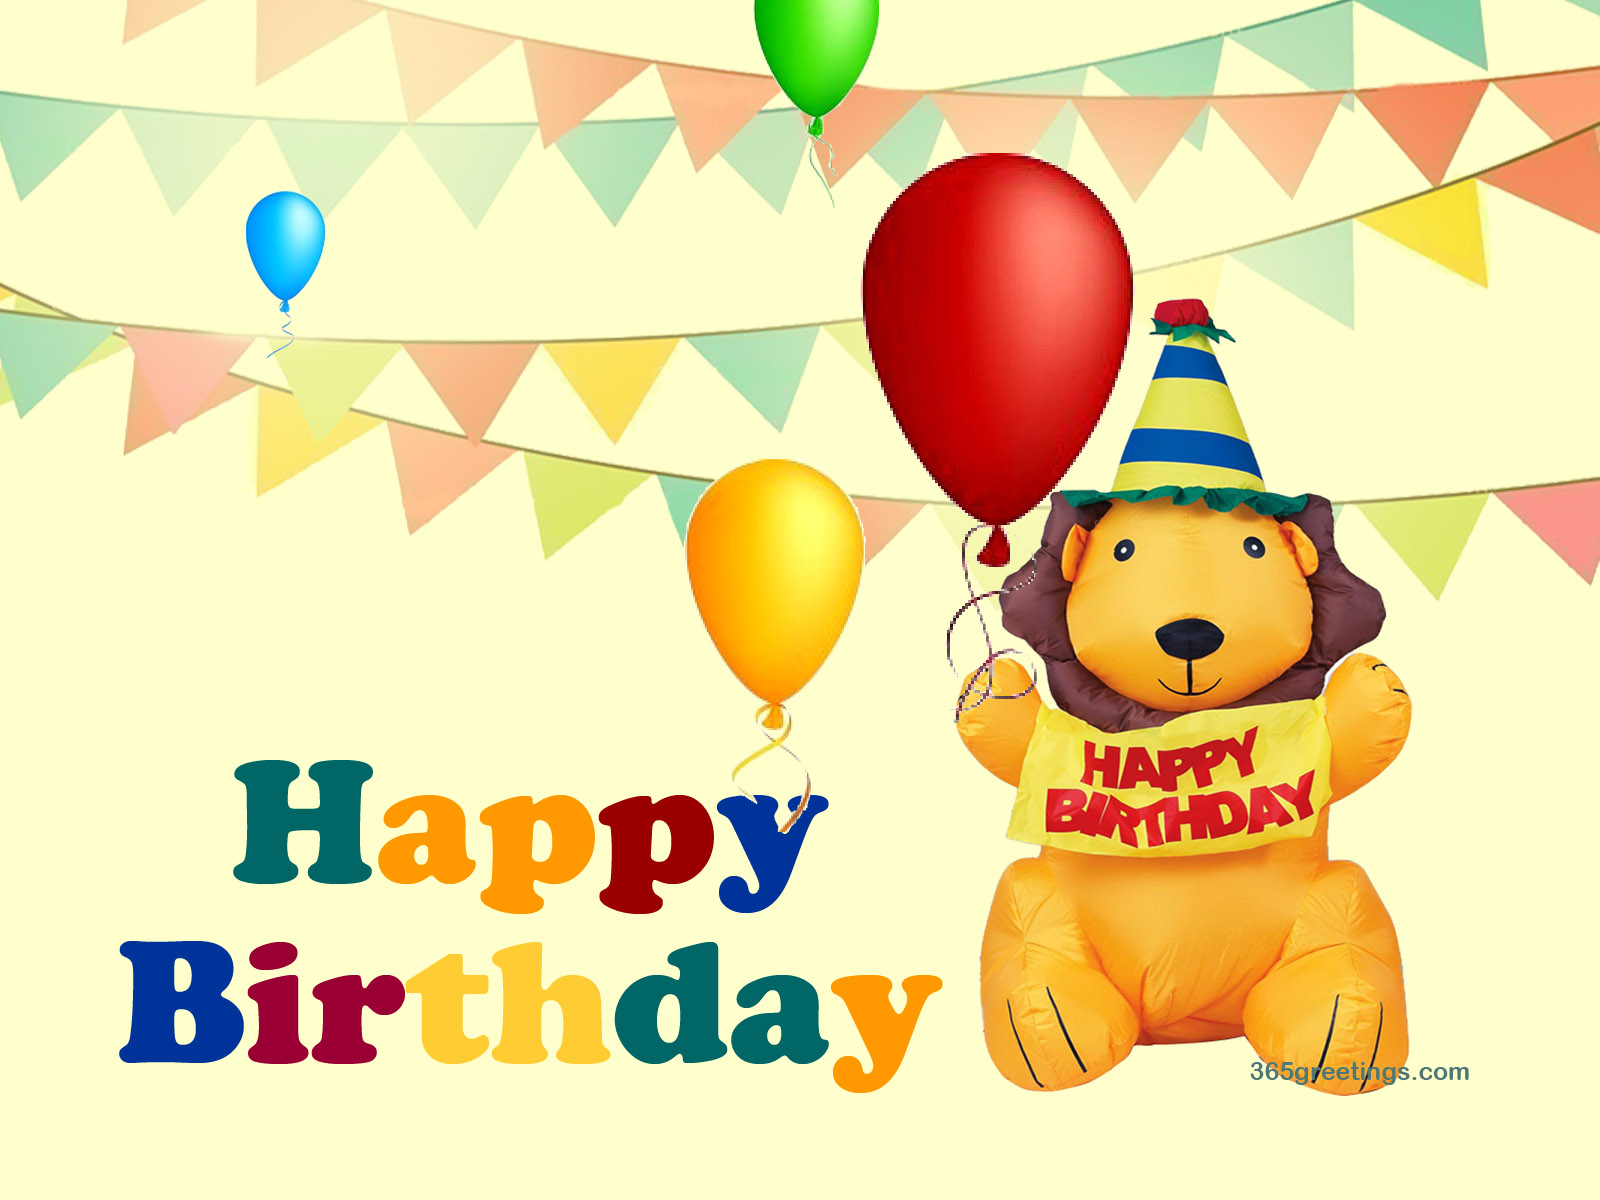 Download ments Happy Birthday Balloons Wallpaper Full